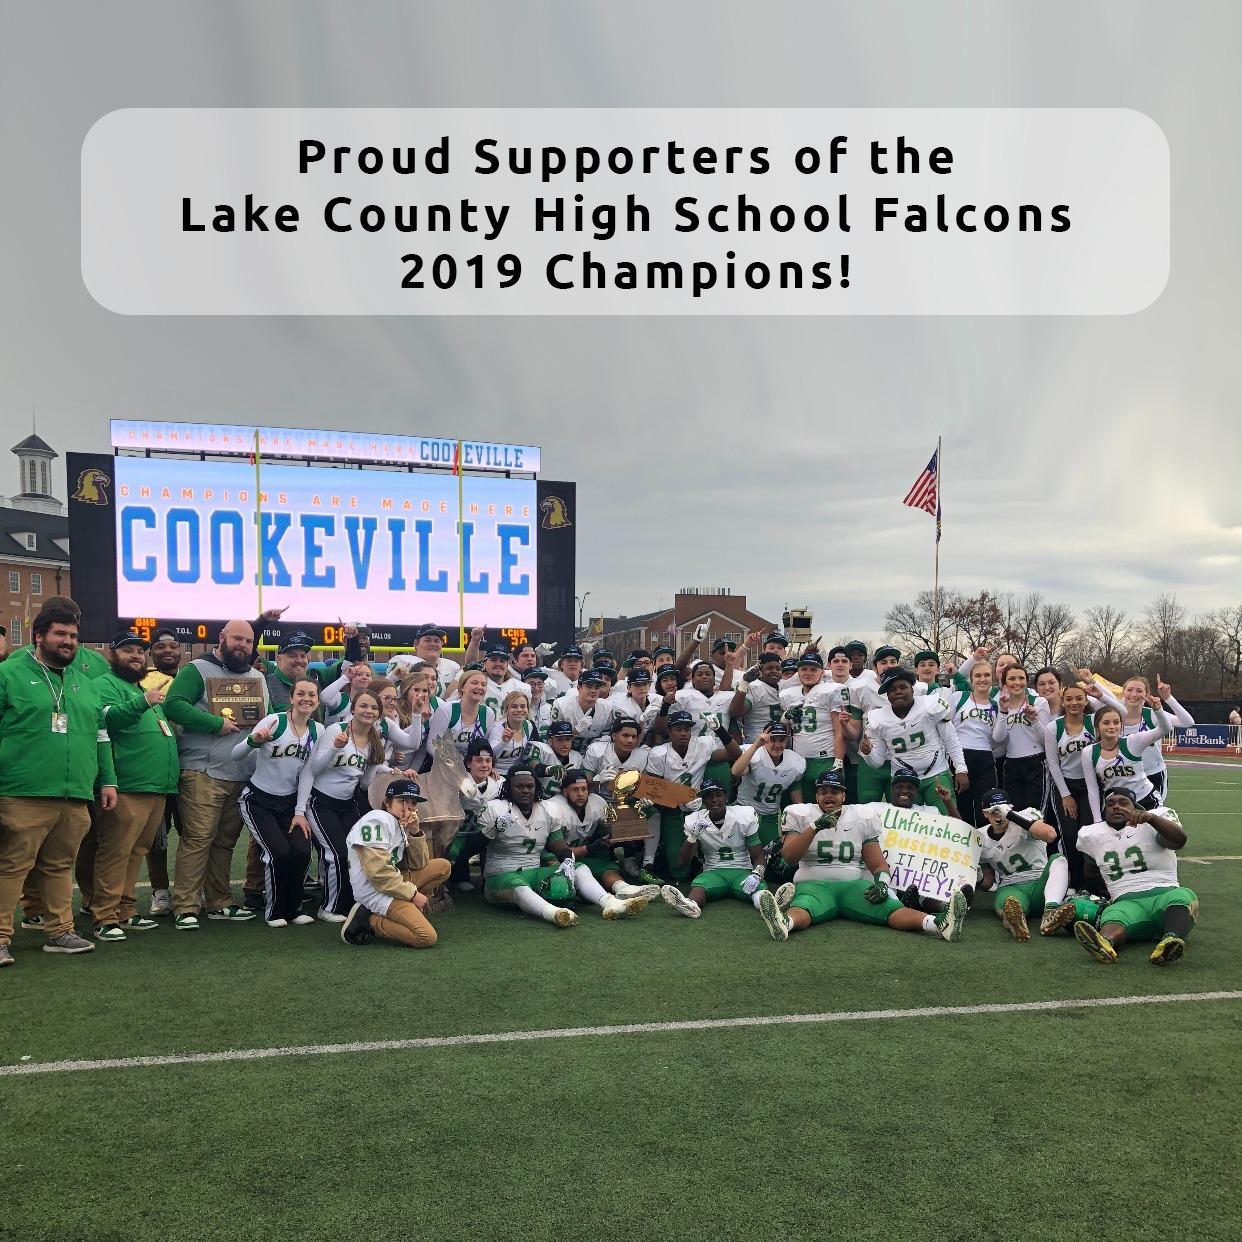 Lake County High School - Falcons